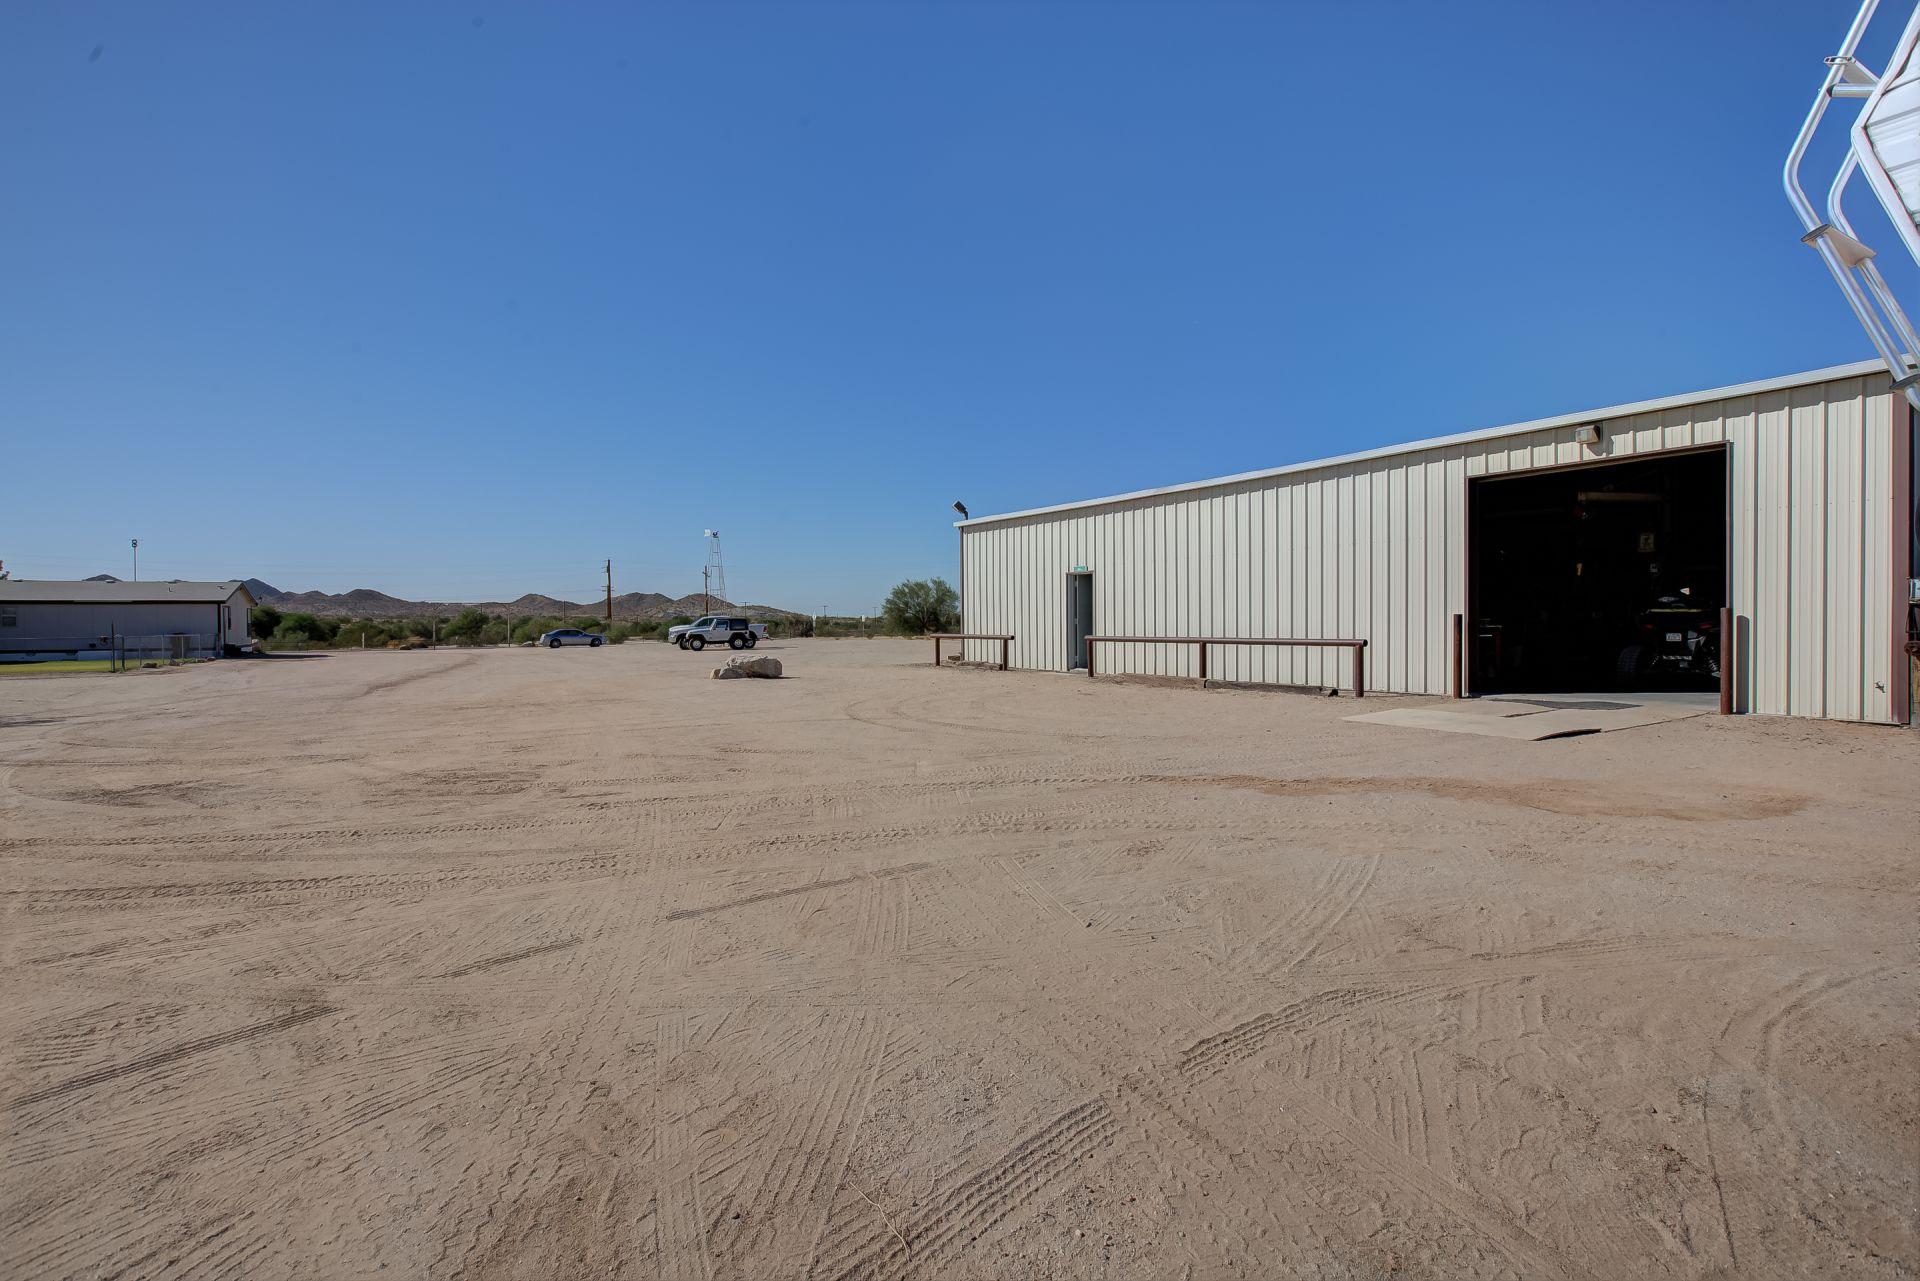 13805 S AIRPORT RD, Buckeye, AZ 85326